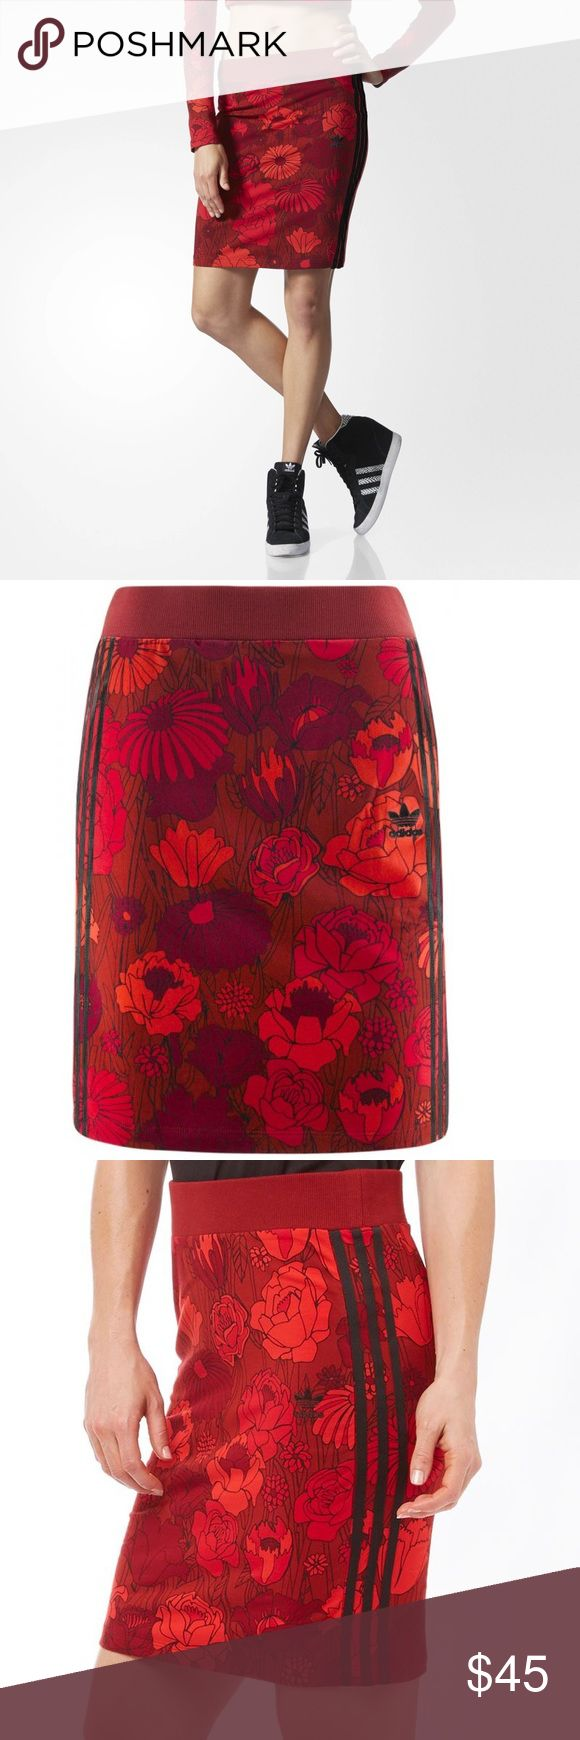 New Adidas Originals Red Floral Midi Skirt Brand new Adidas